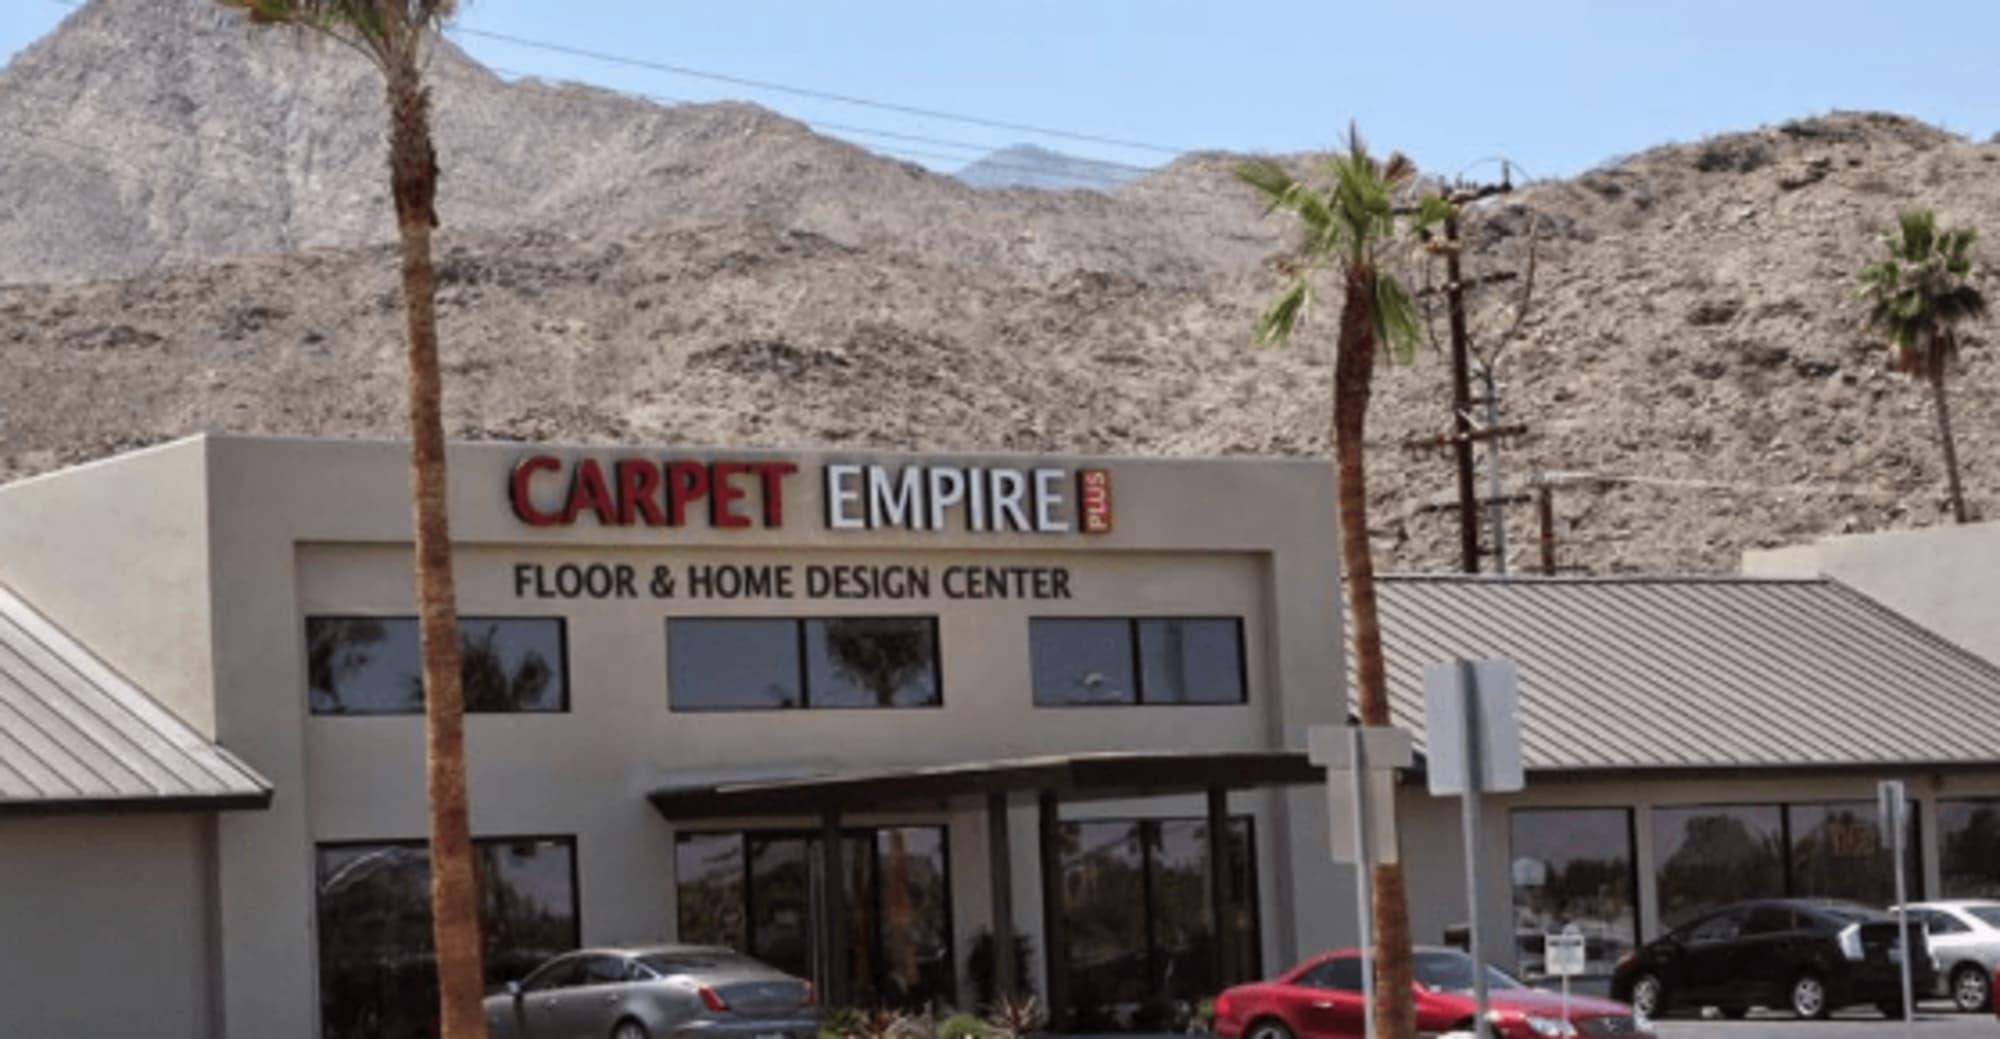 Carpet Empire Plus - 68307 E Palm Canyon Dr Cathedral City, CA 92234